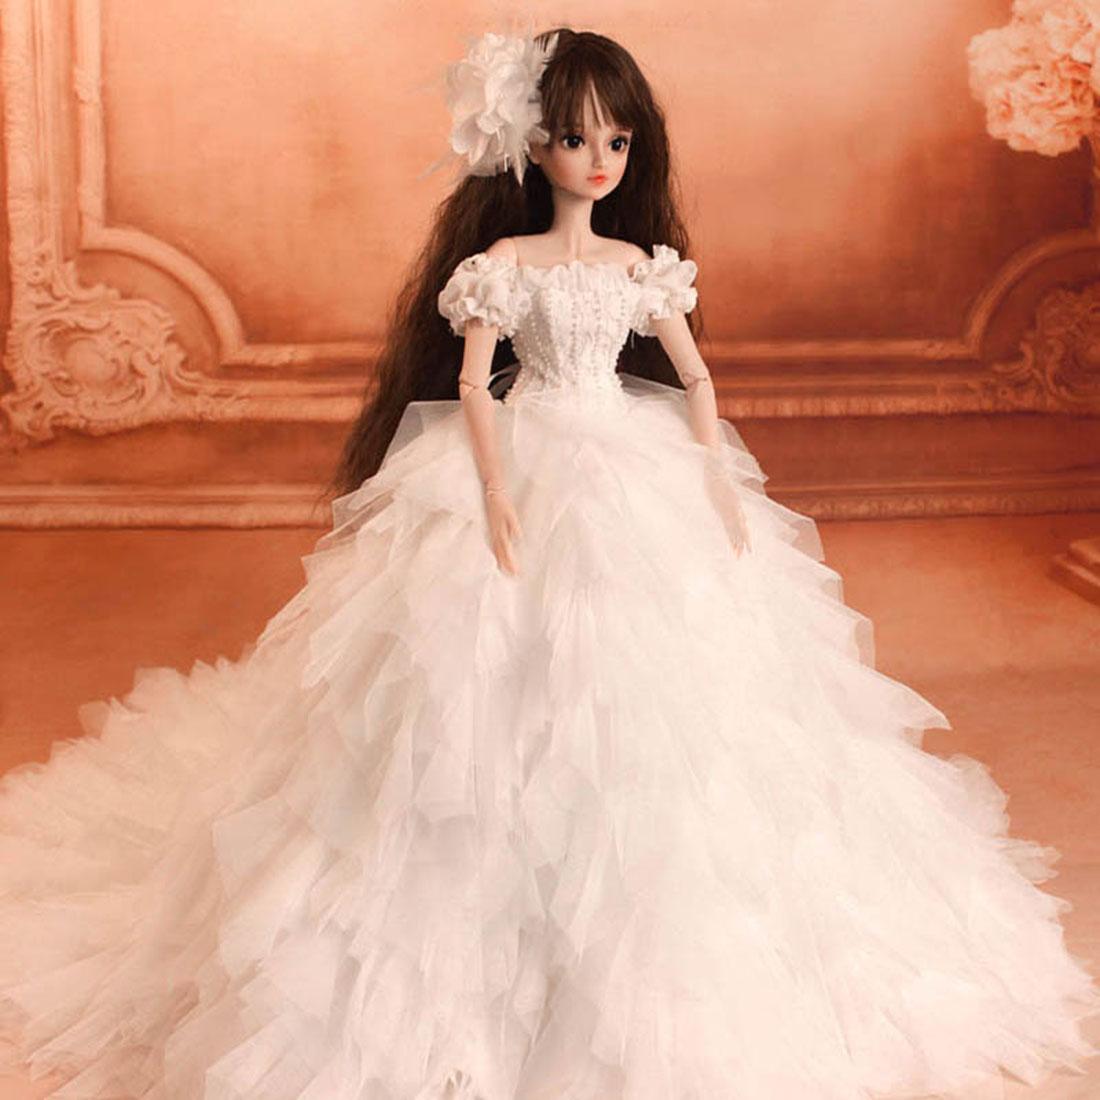 Modikerbjd Women Romantic White Wedding Dress Princess Clothes Set for 1/4 1/3 BJD Dolls - No Doll